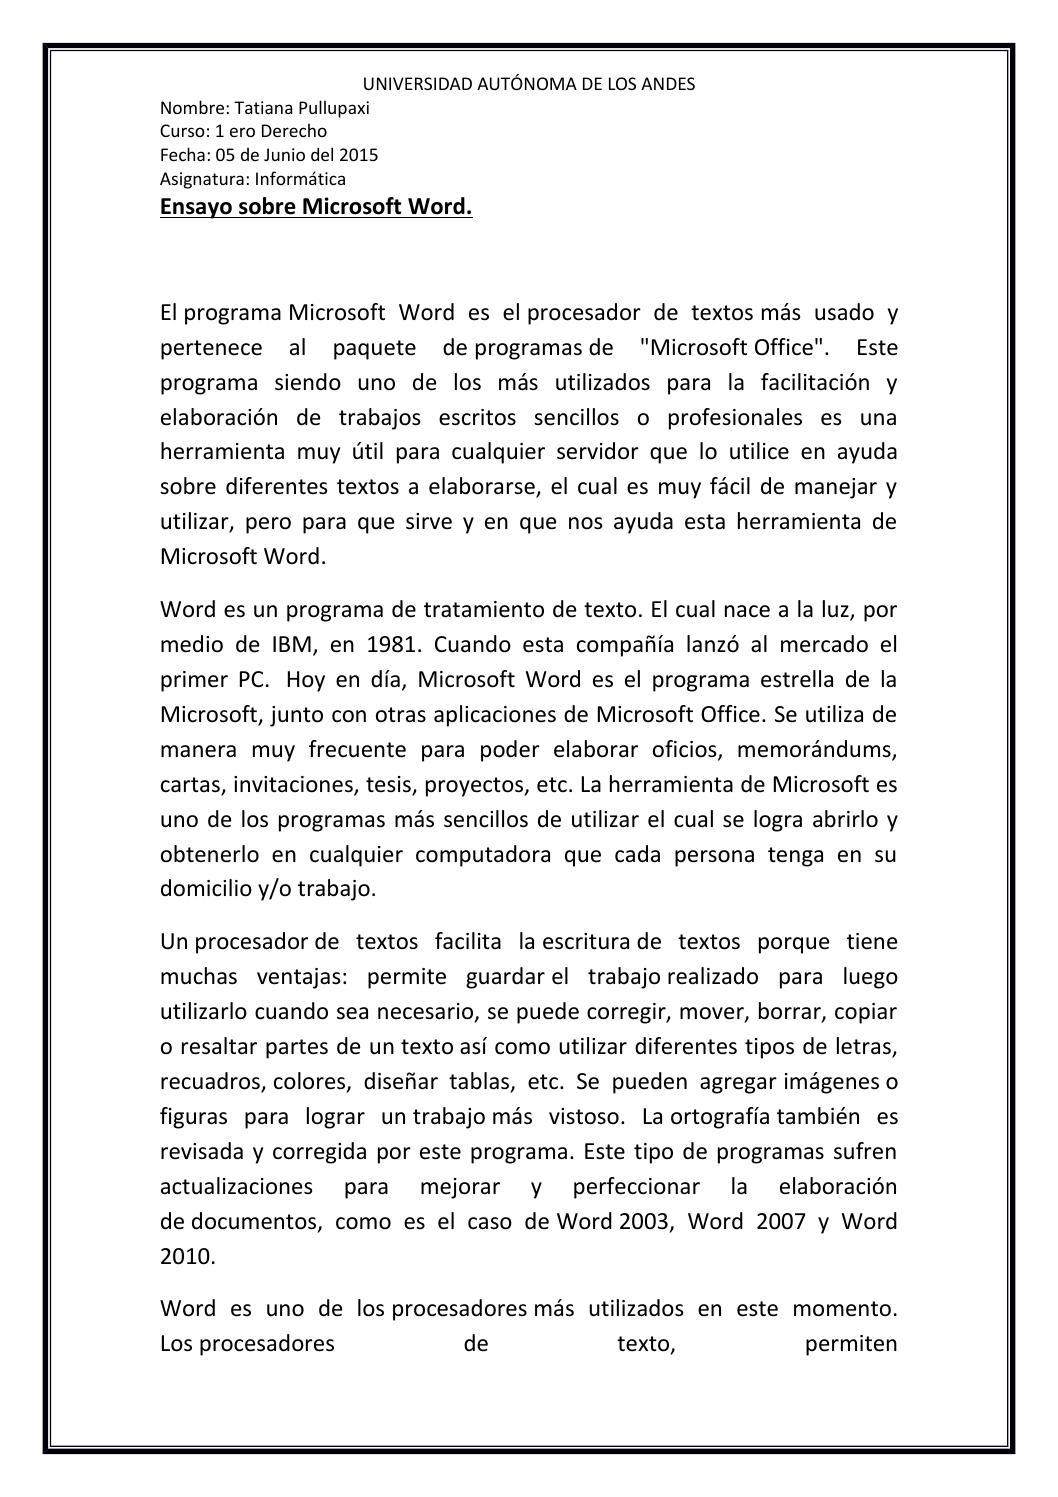 Ensayo sobre microsoft word by TatianaPullupaxi - Issuu